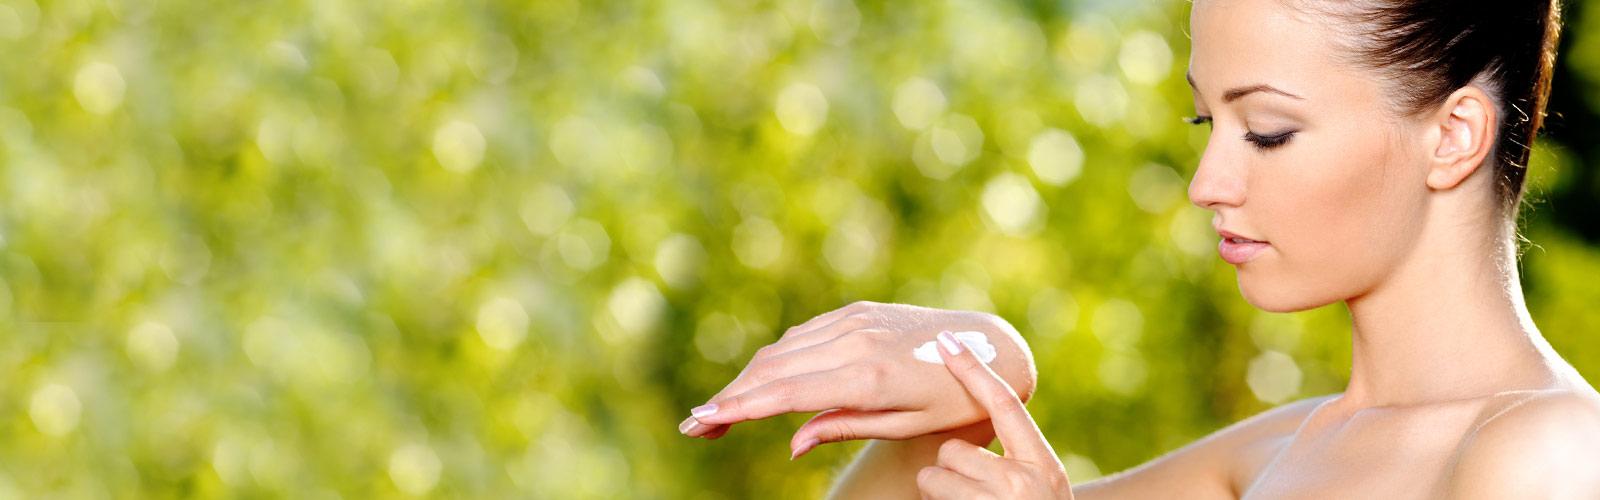 Cosmetica naturale a base di latte di cavalla